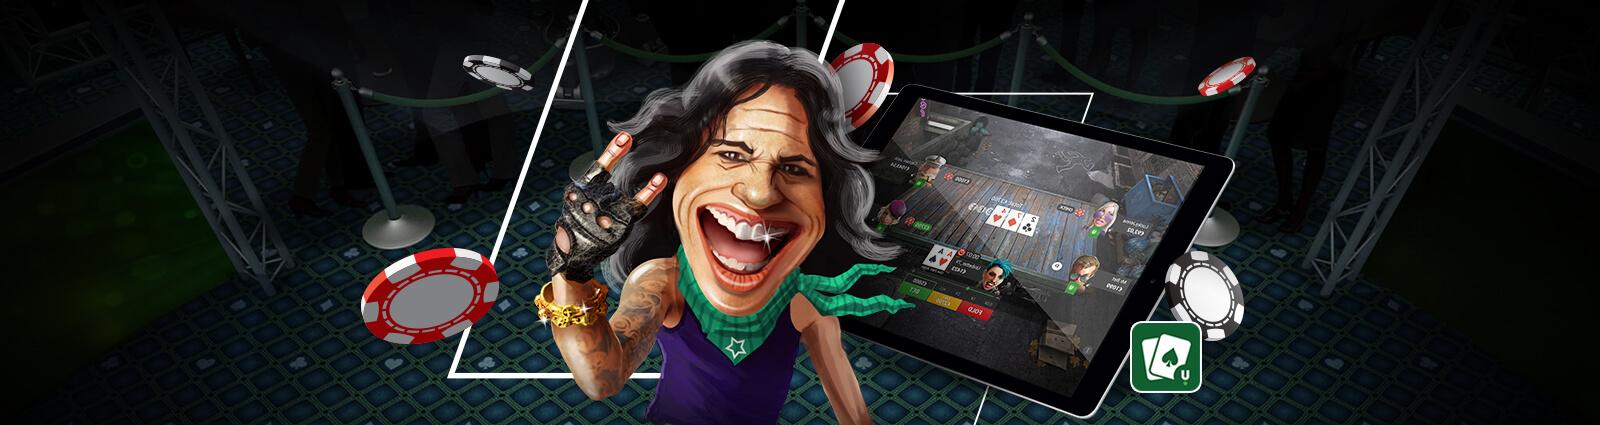 Unibet-Evolution-Poker-APP-promo-page-banner